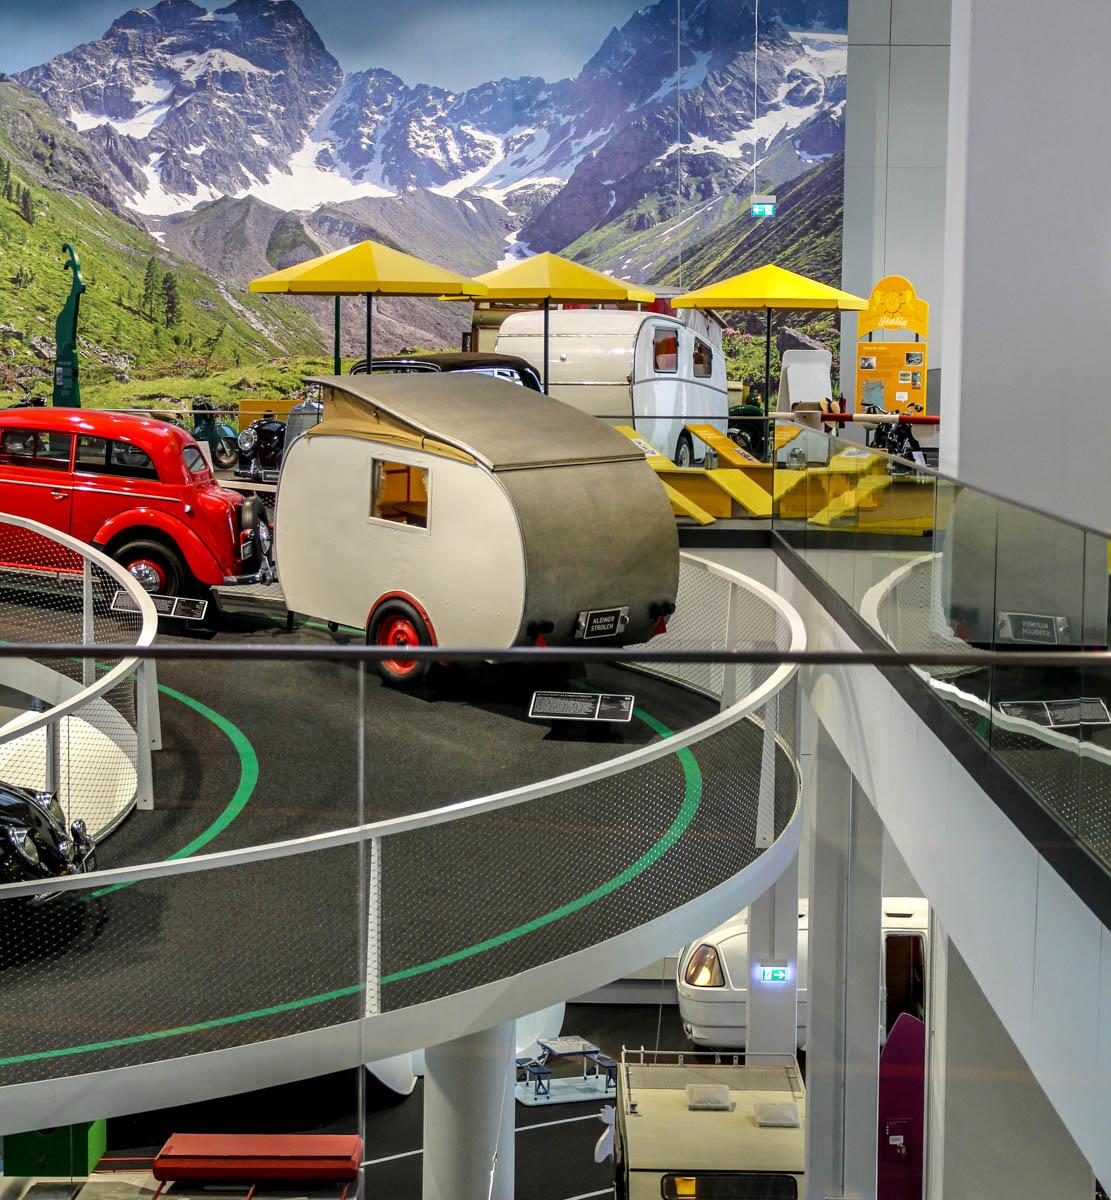 Ausflug mit Kindern, Kinder, Erwin Hymer, Hymer, Erwin Hymer Museum, Hymer Museum, Trip Tipp, Ausflugstipp, Ulm, Allgäu, Bayern